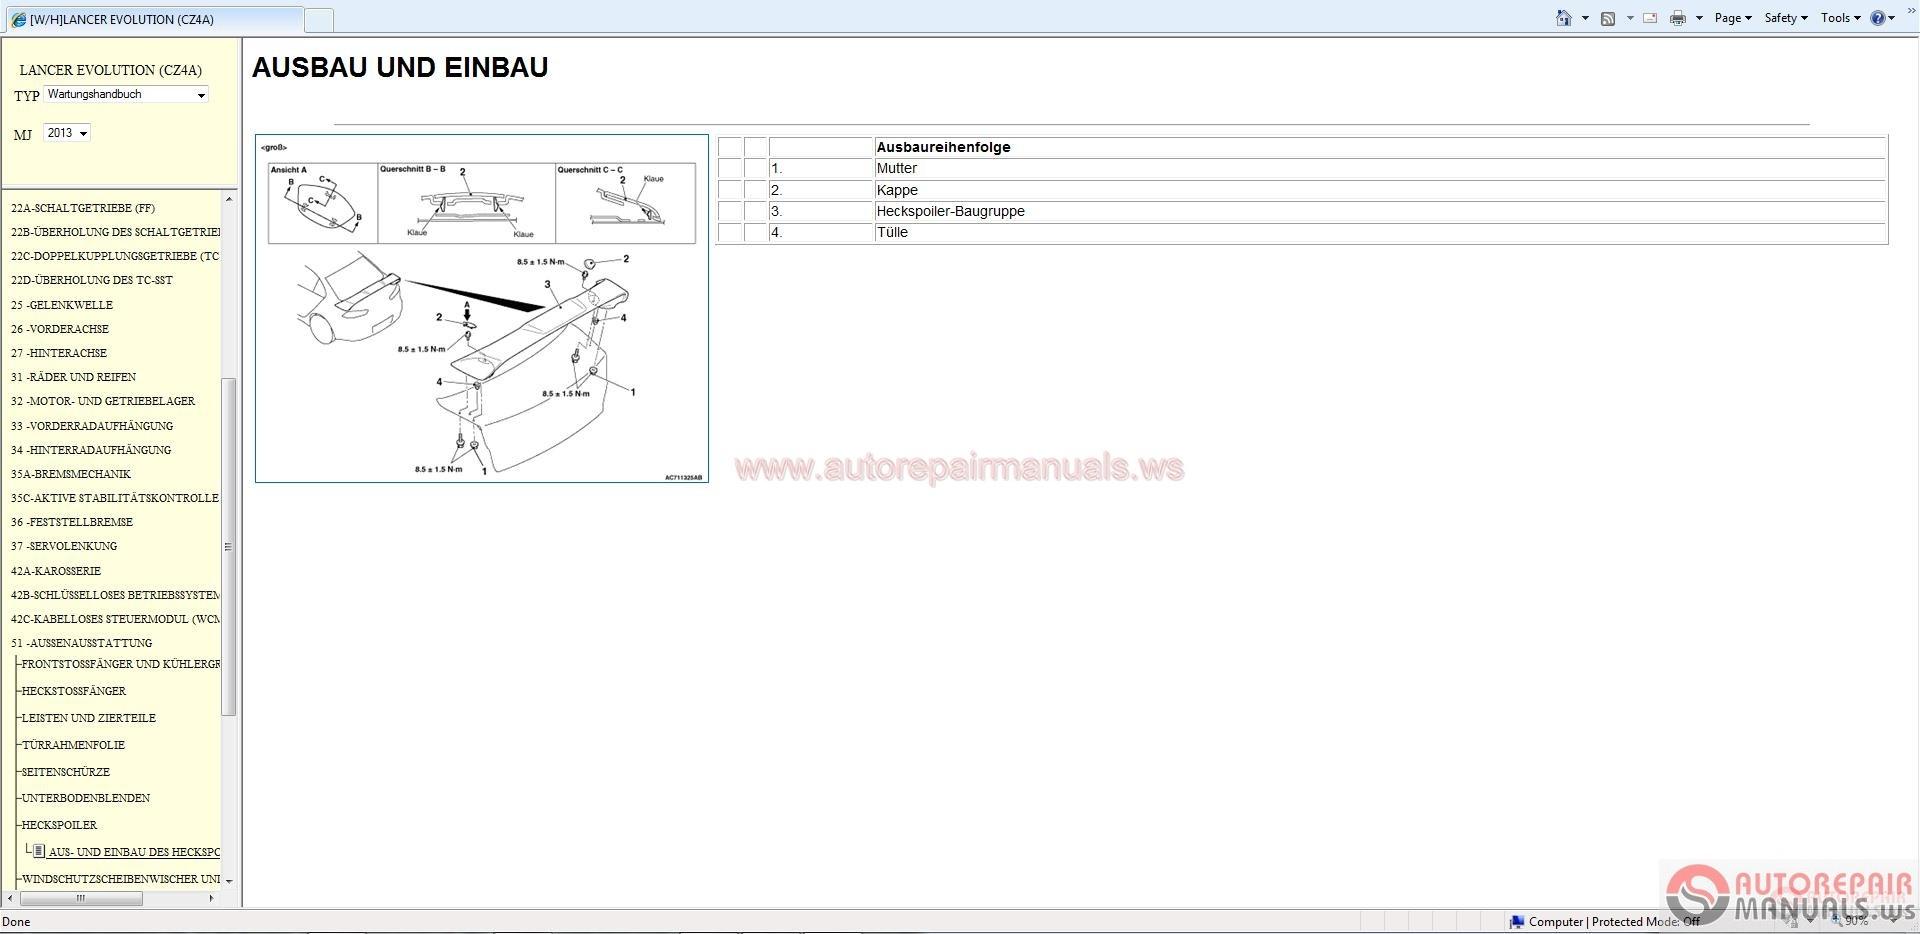 mitsubishi lancer evo x 2013 service manual auto repair. Black Bedroom Furniture Sets. Home Design Ideas